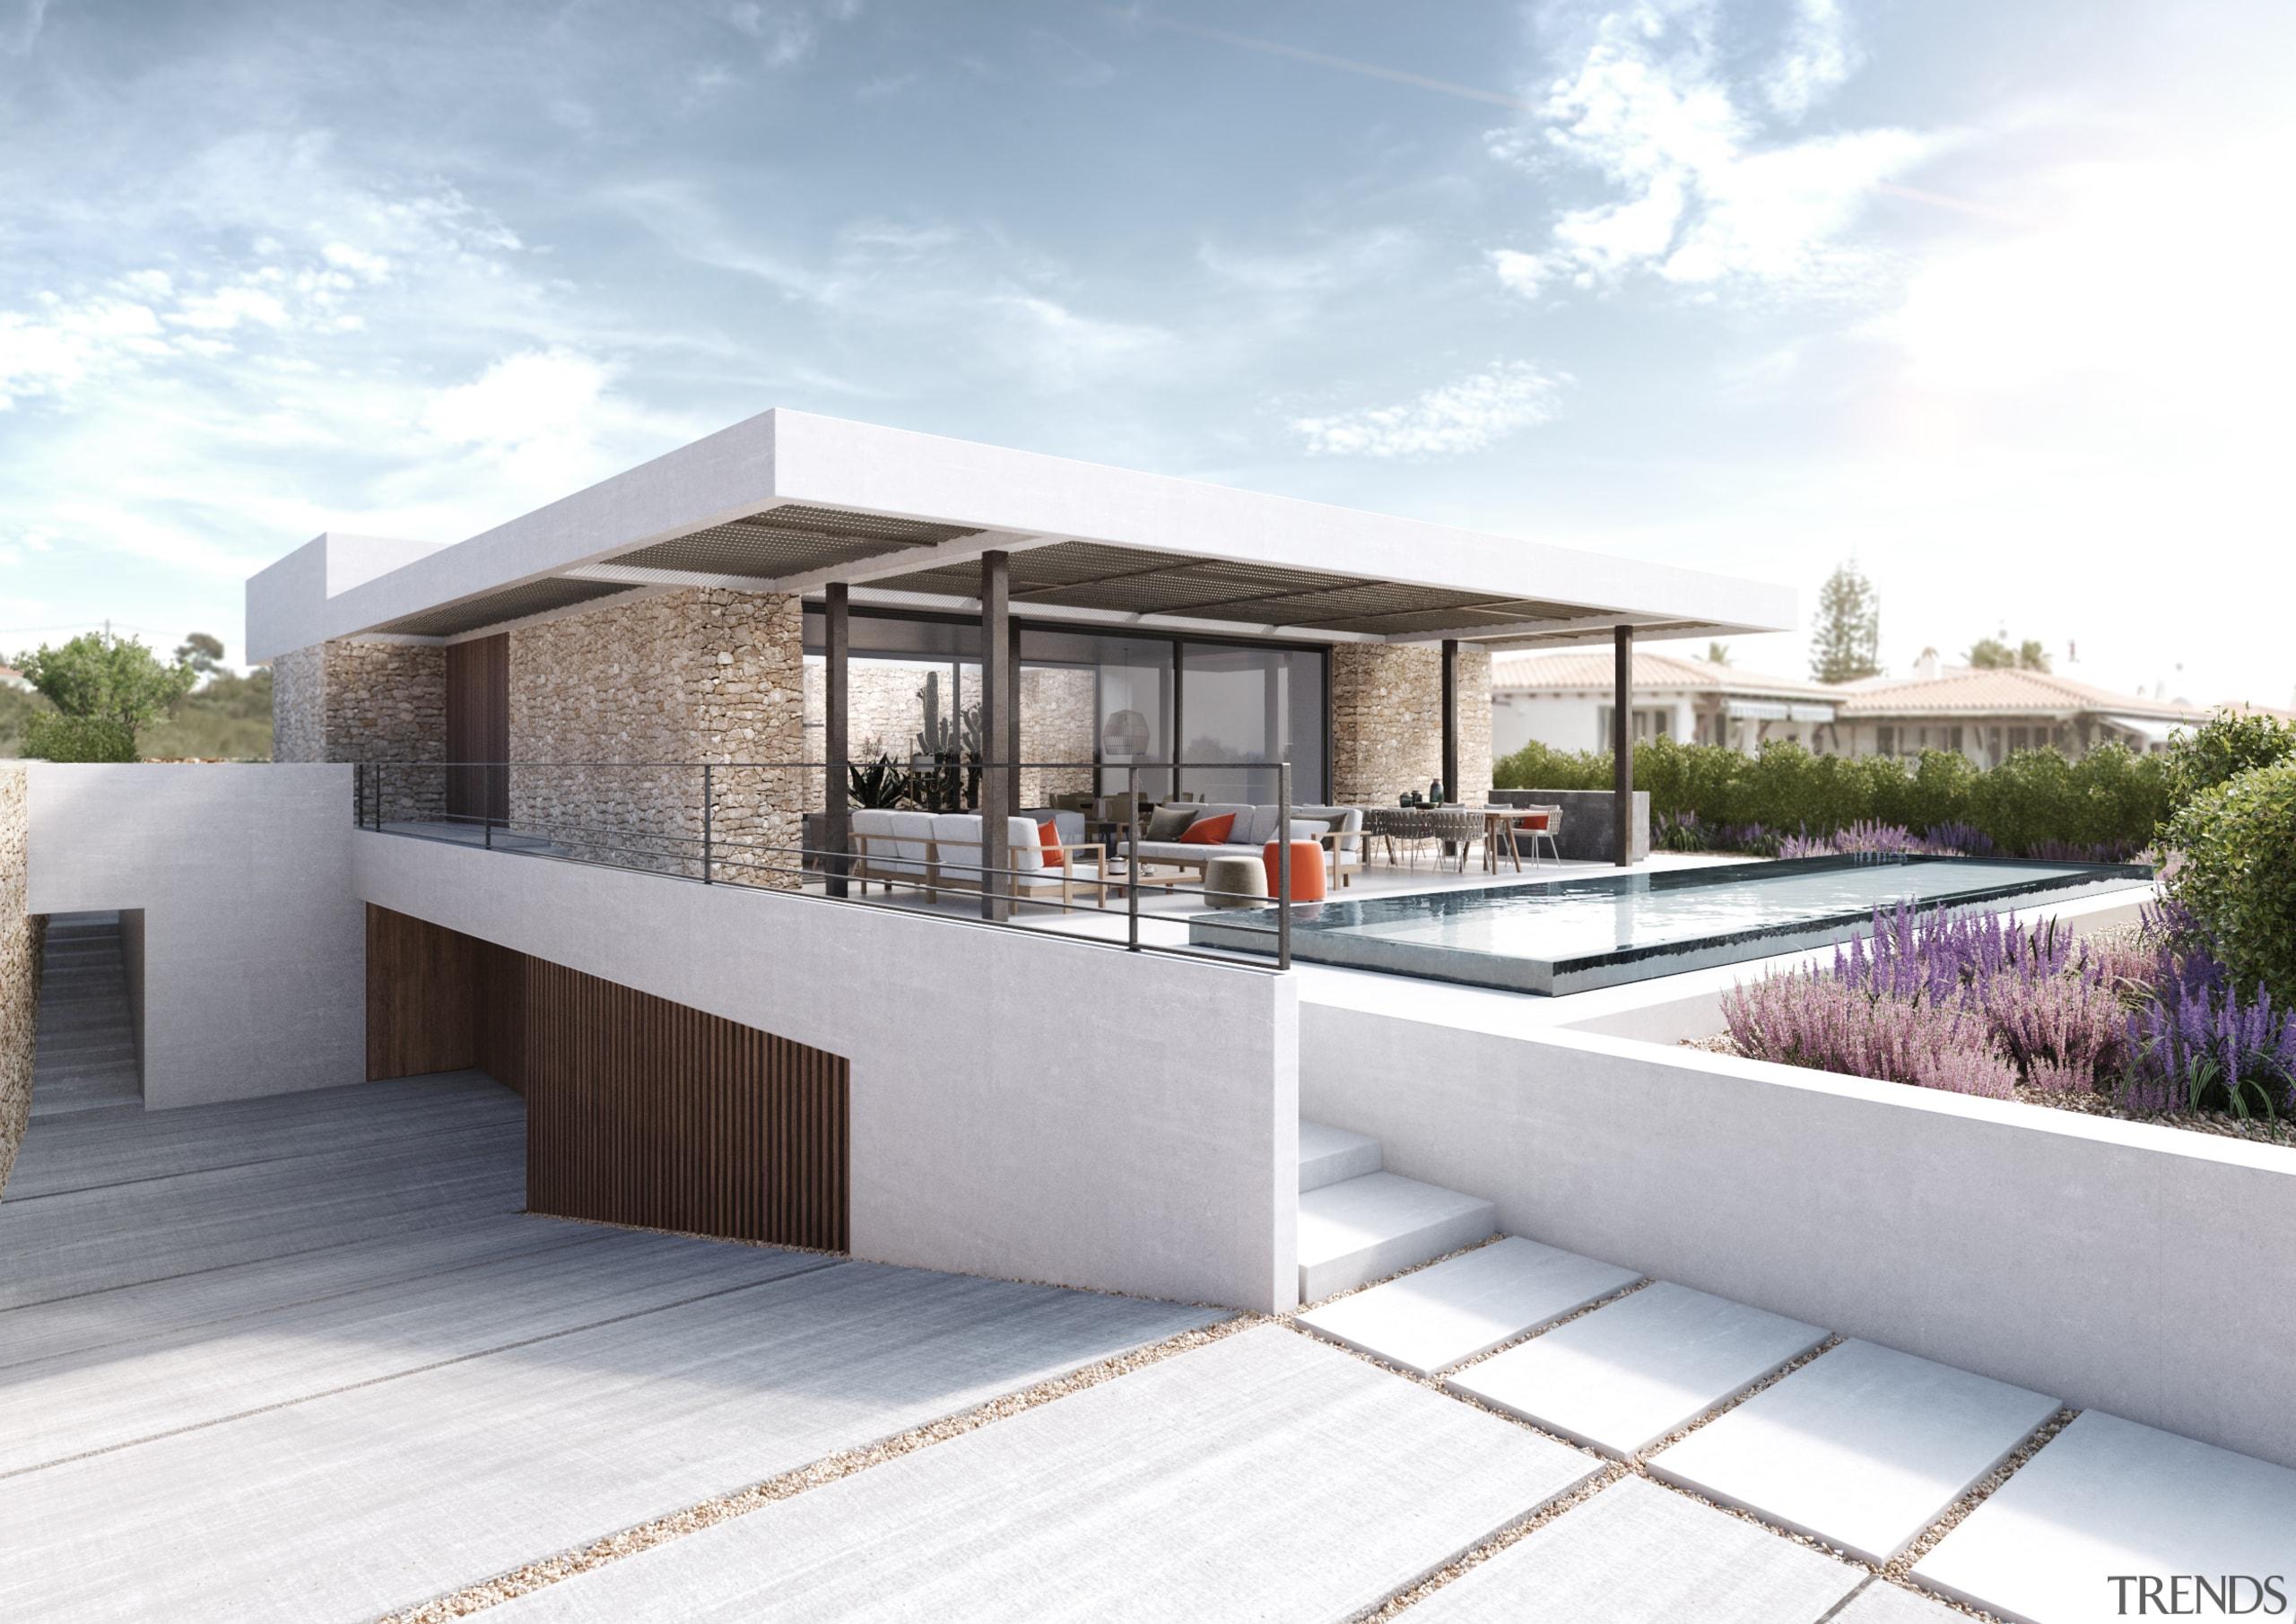 Island life – Corner view - architecture   architecture, facade, home, house, property, real estate, white